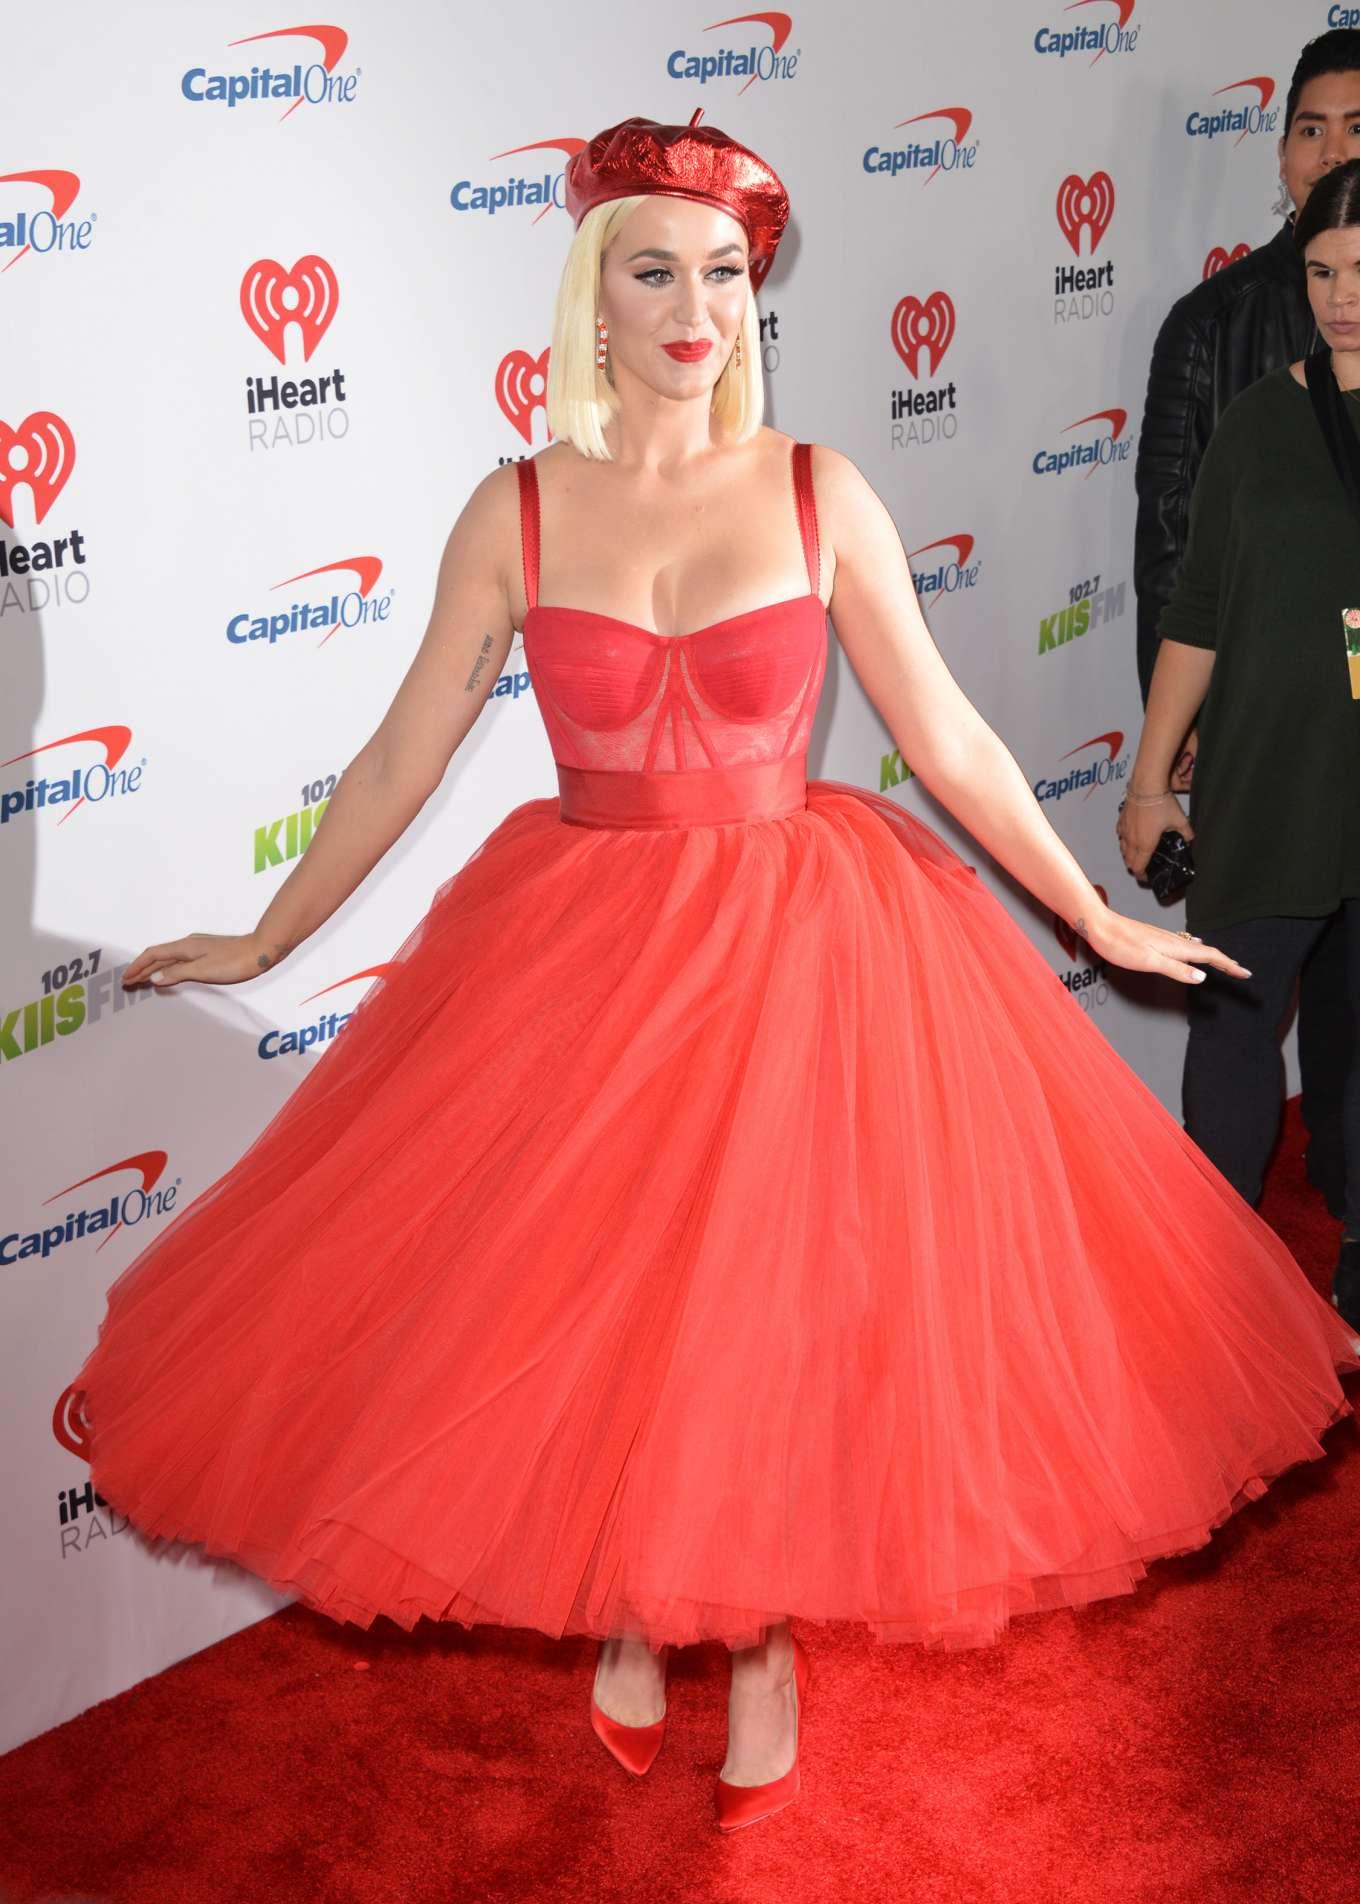 Katy Perry 2019 : Katy Perry – 2019 KIIS FMs iHeartRadio Jingle Ball-14